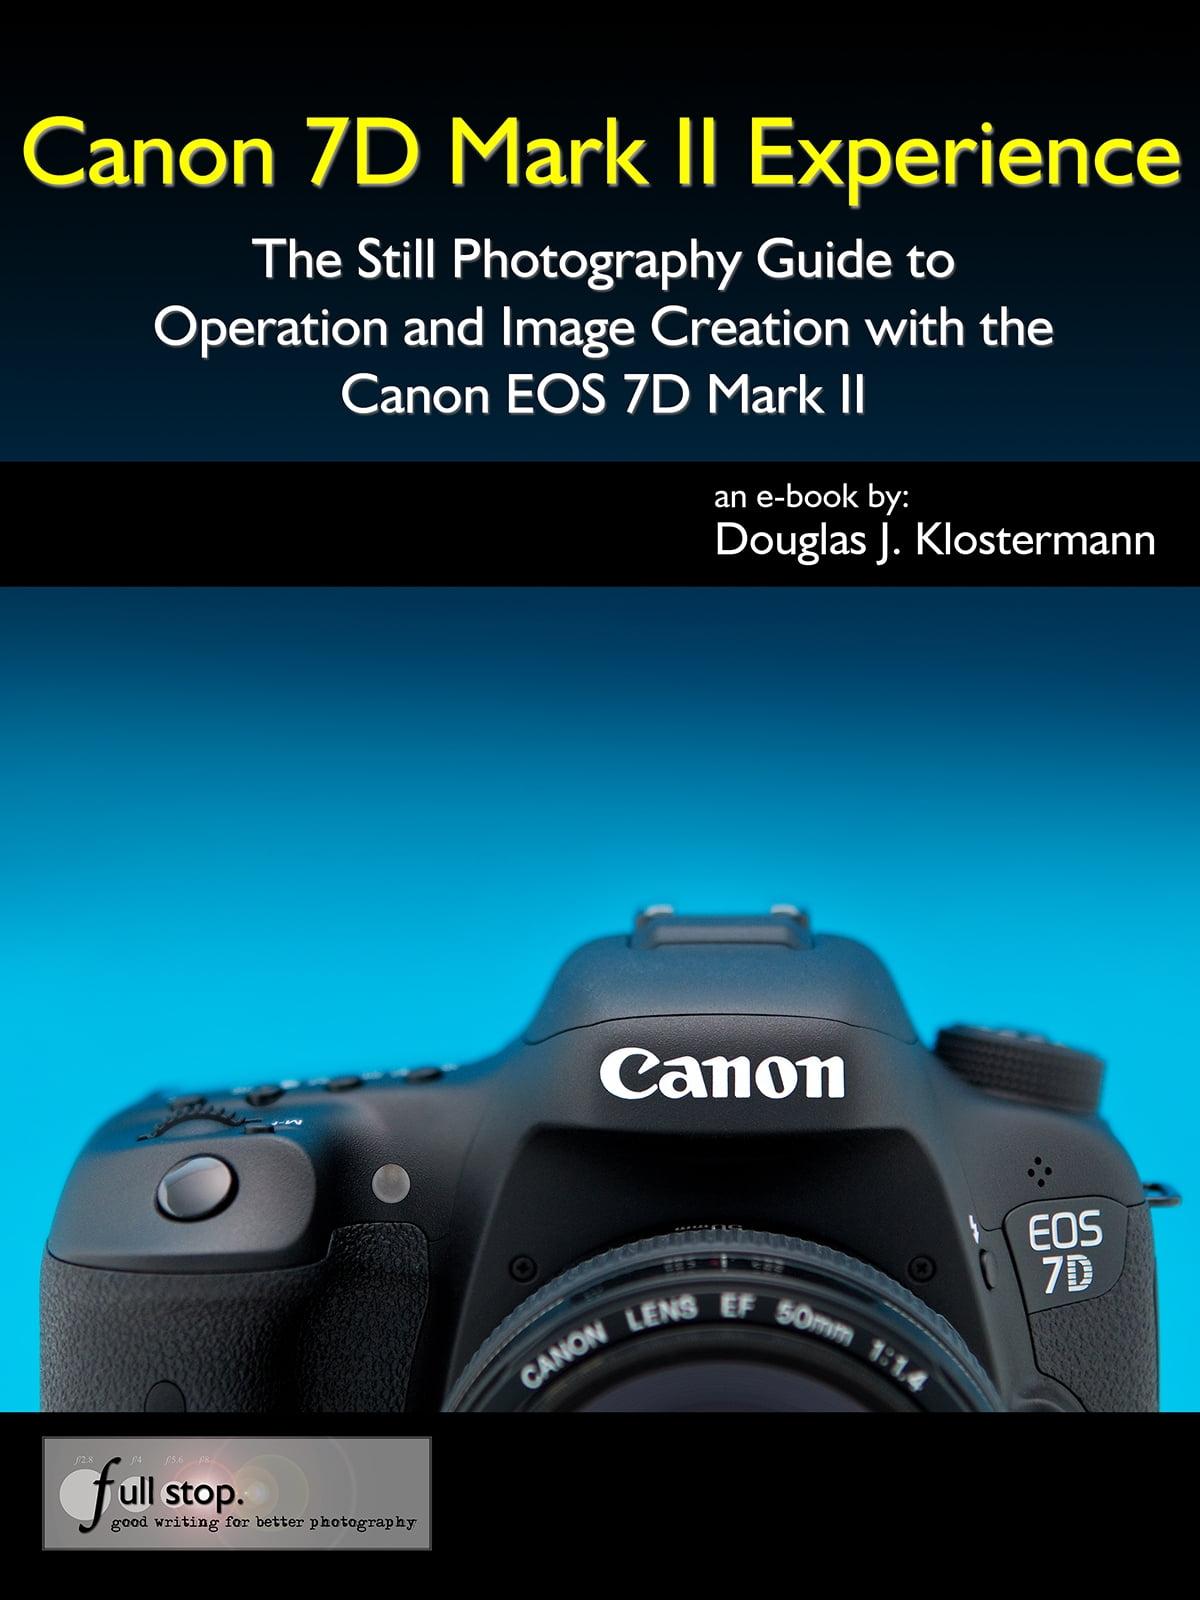 Canon Eos 7d Mark Ii : canon, Canon, Experience, Still, Photography, Guide, Operation, Image, Creation, EBook, Douglas, Klostermann, Rakuten